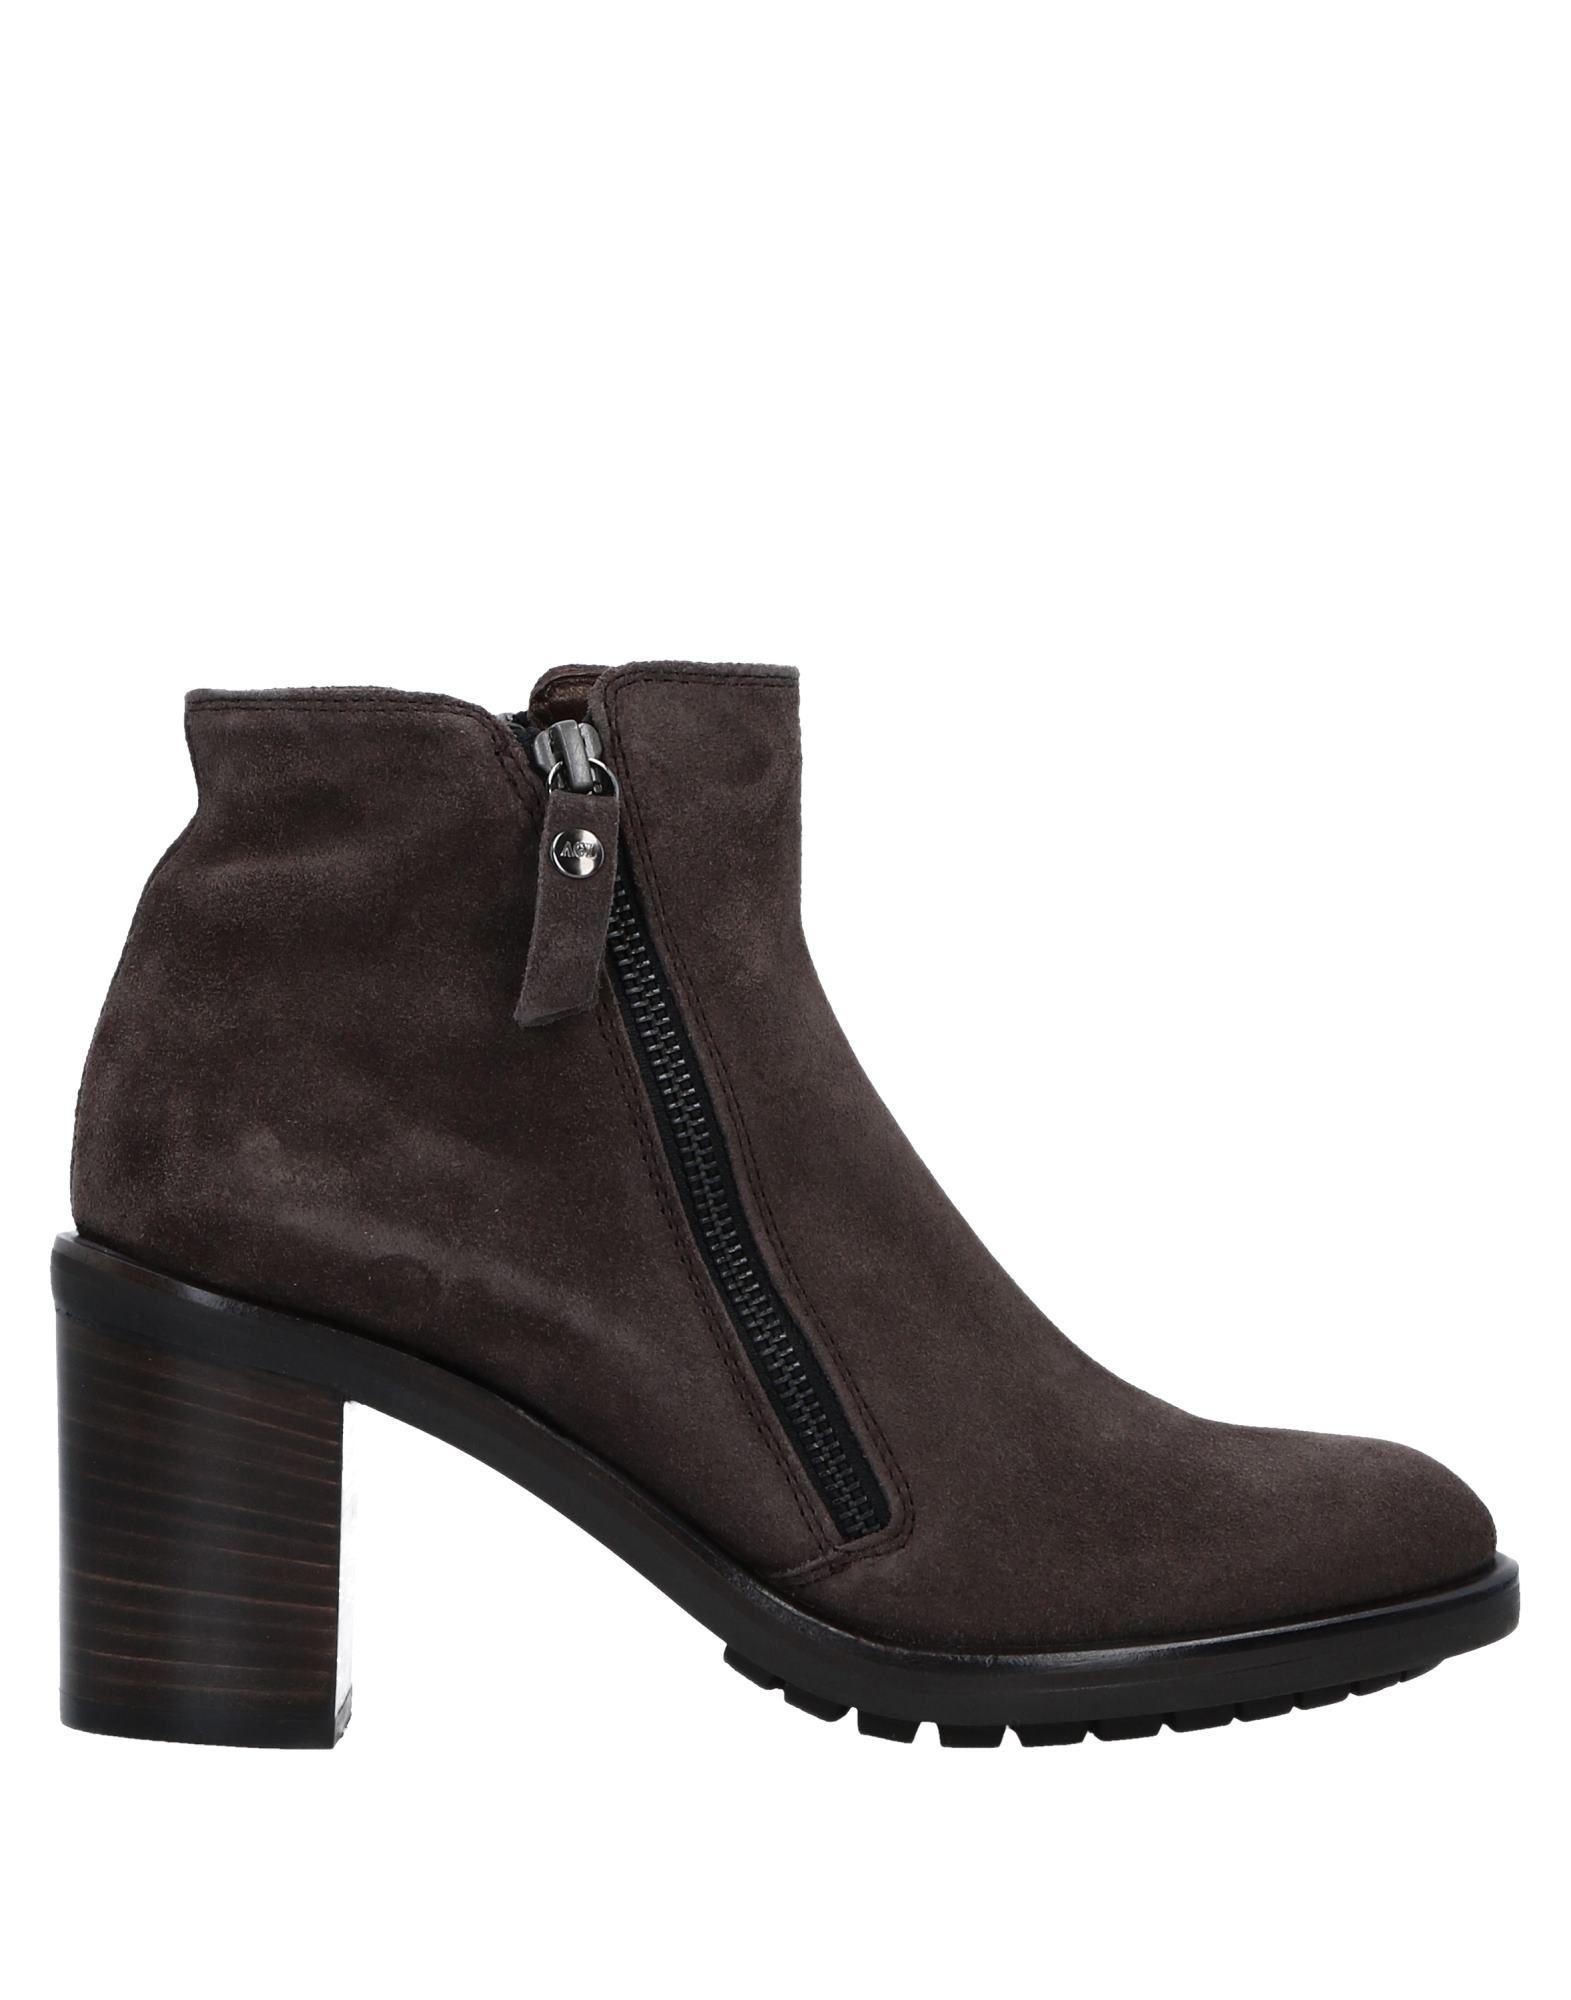 Stilvolle billige Schuhe Damen Agl Attilio Giusti Leombruni Stiefelette Damen Schuhe  11539917OB f11d2f